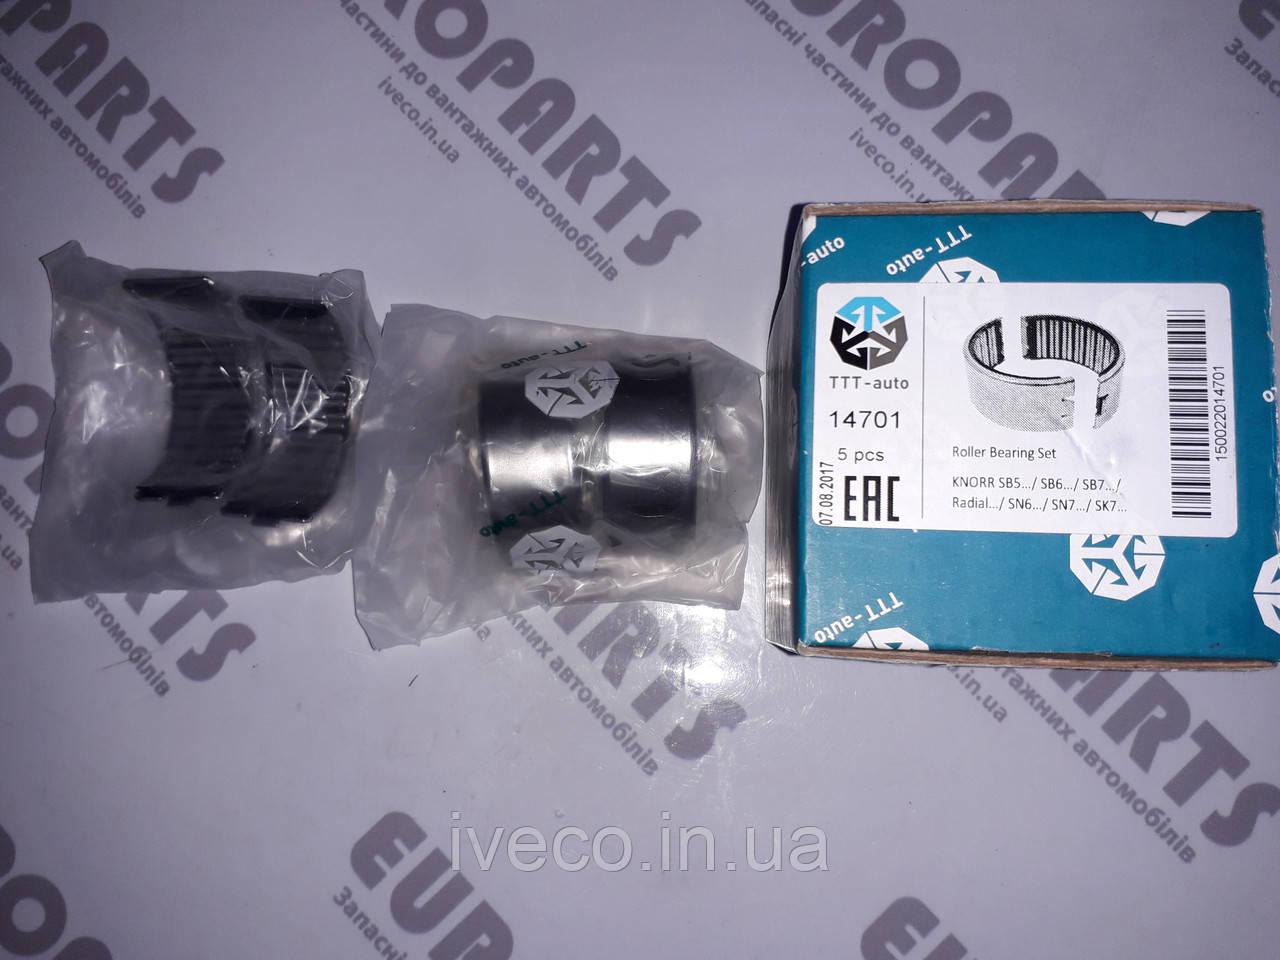 Ремкомплект суппорта KNORR SB5 SB6 SB7 SK7,SN6, RADIAL, подшипники (пр-во TTT-auto)  CKSK.14  14701   K0017